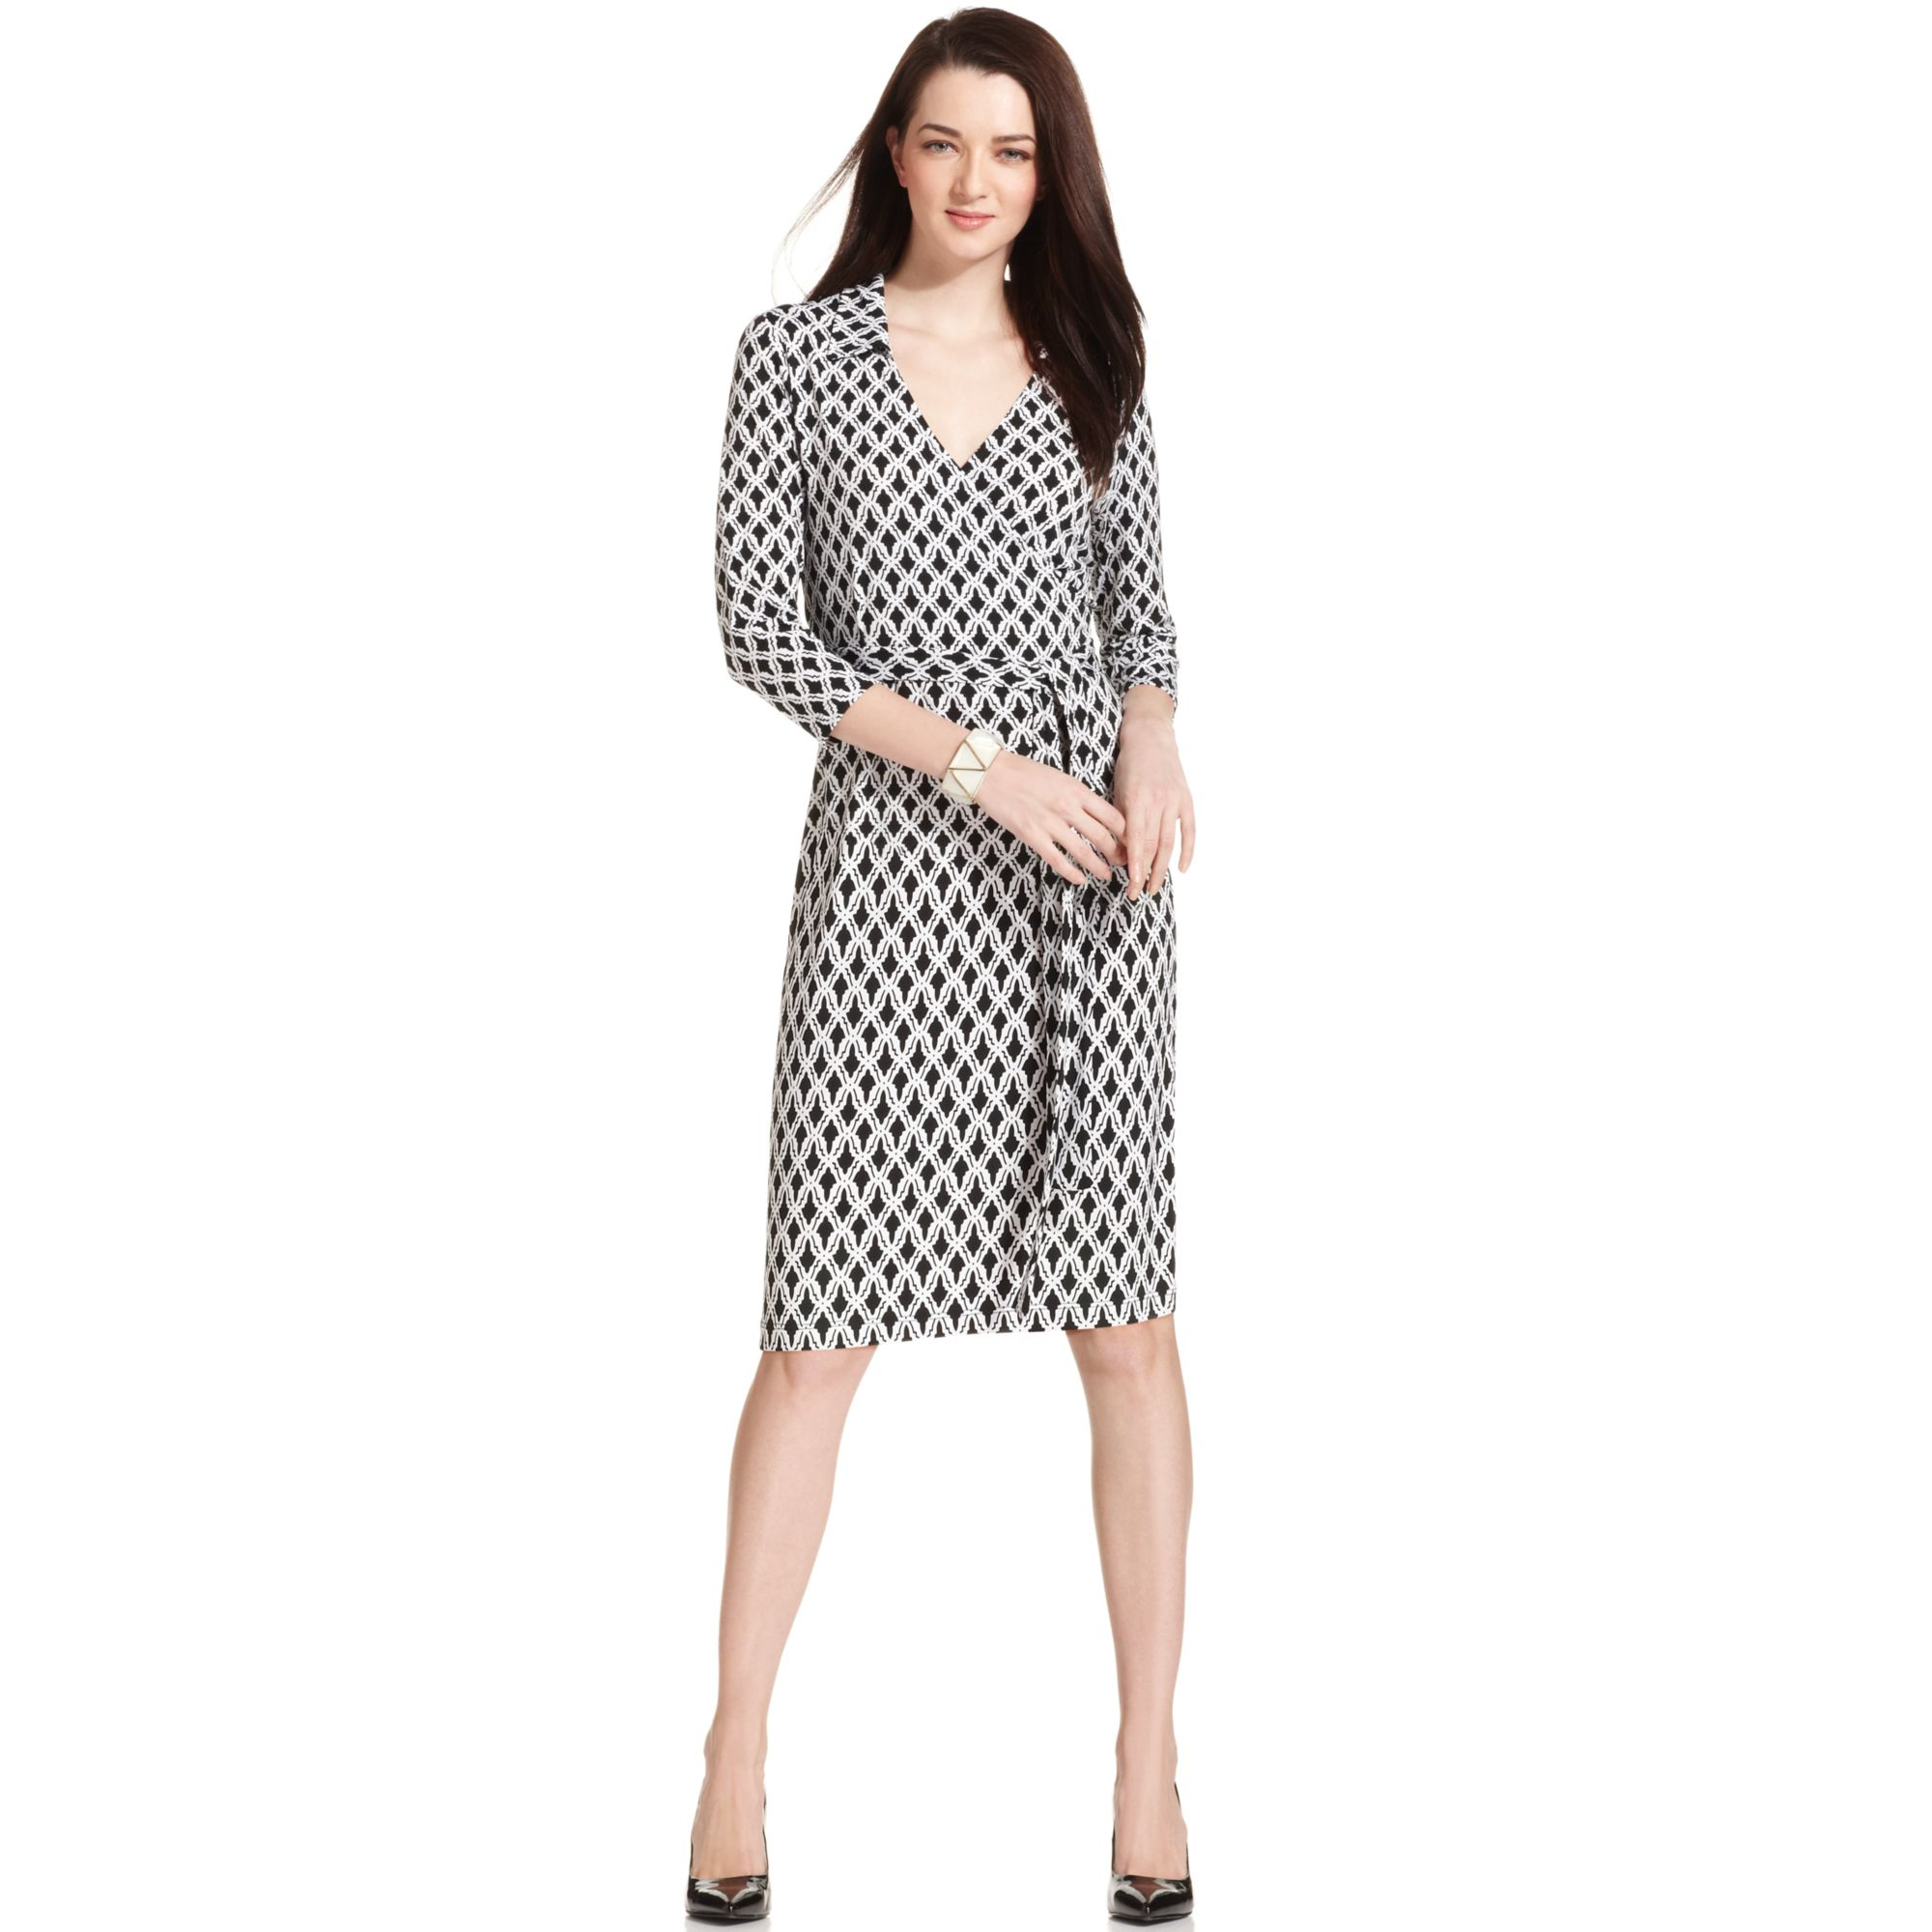 Jones New York Dress – Fashion dresses